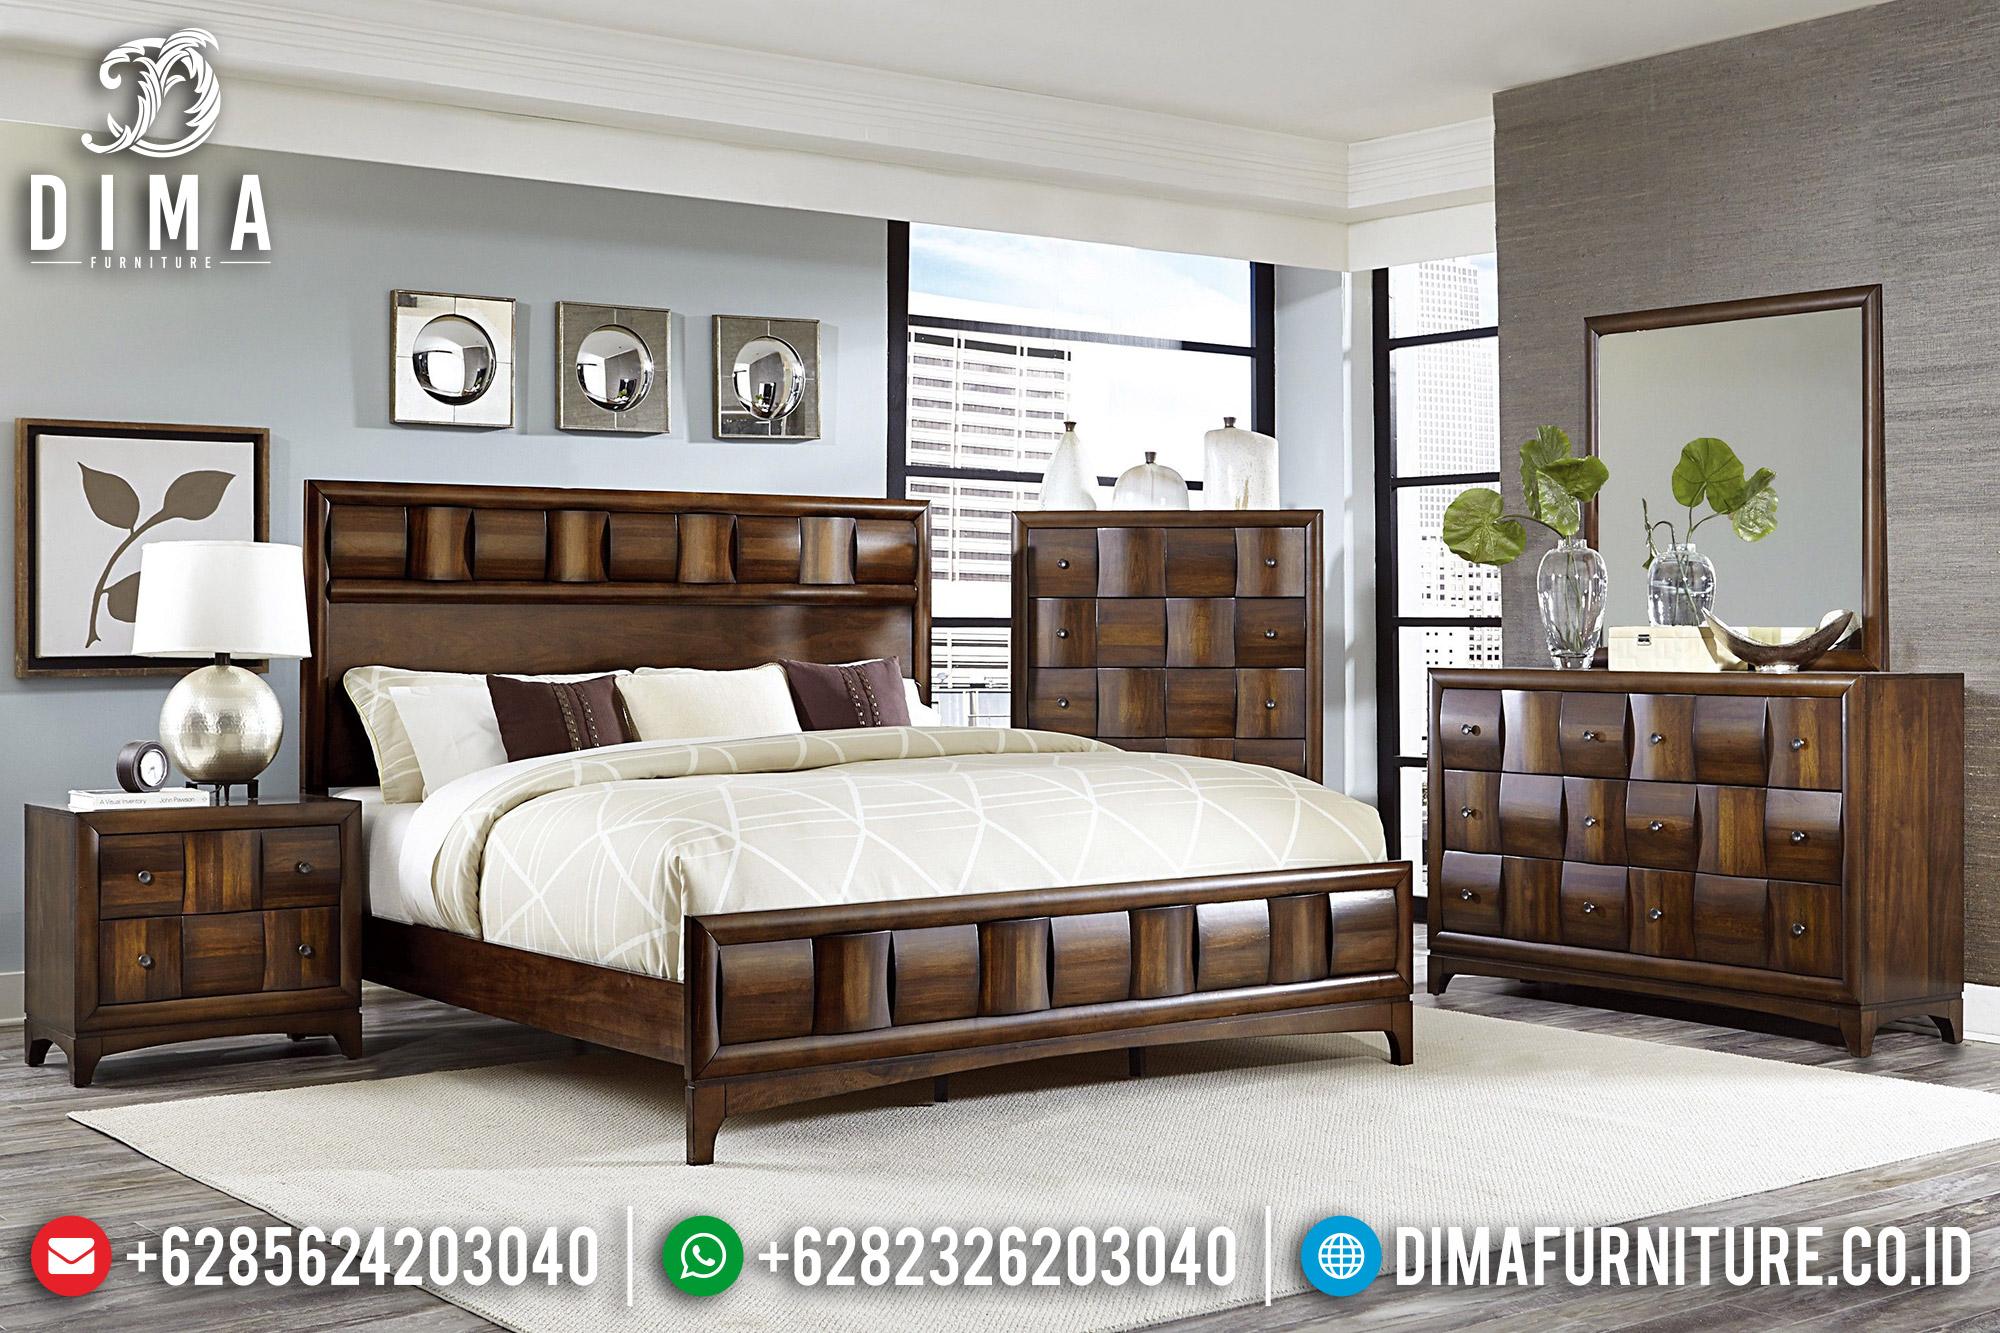 Model Tempat Tidur Jati Jepara Minimalis 2019 MMJ-0175